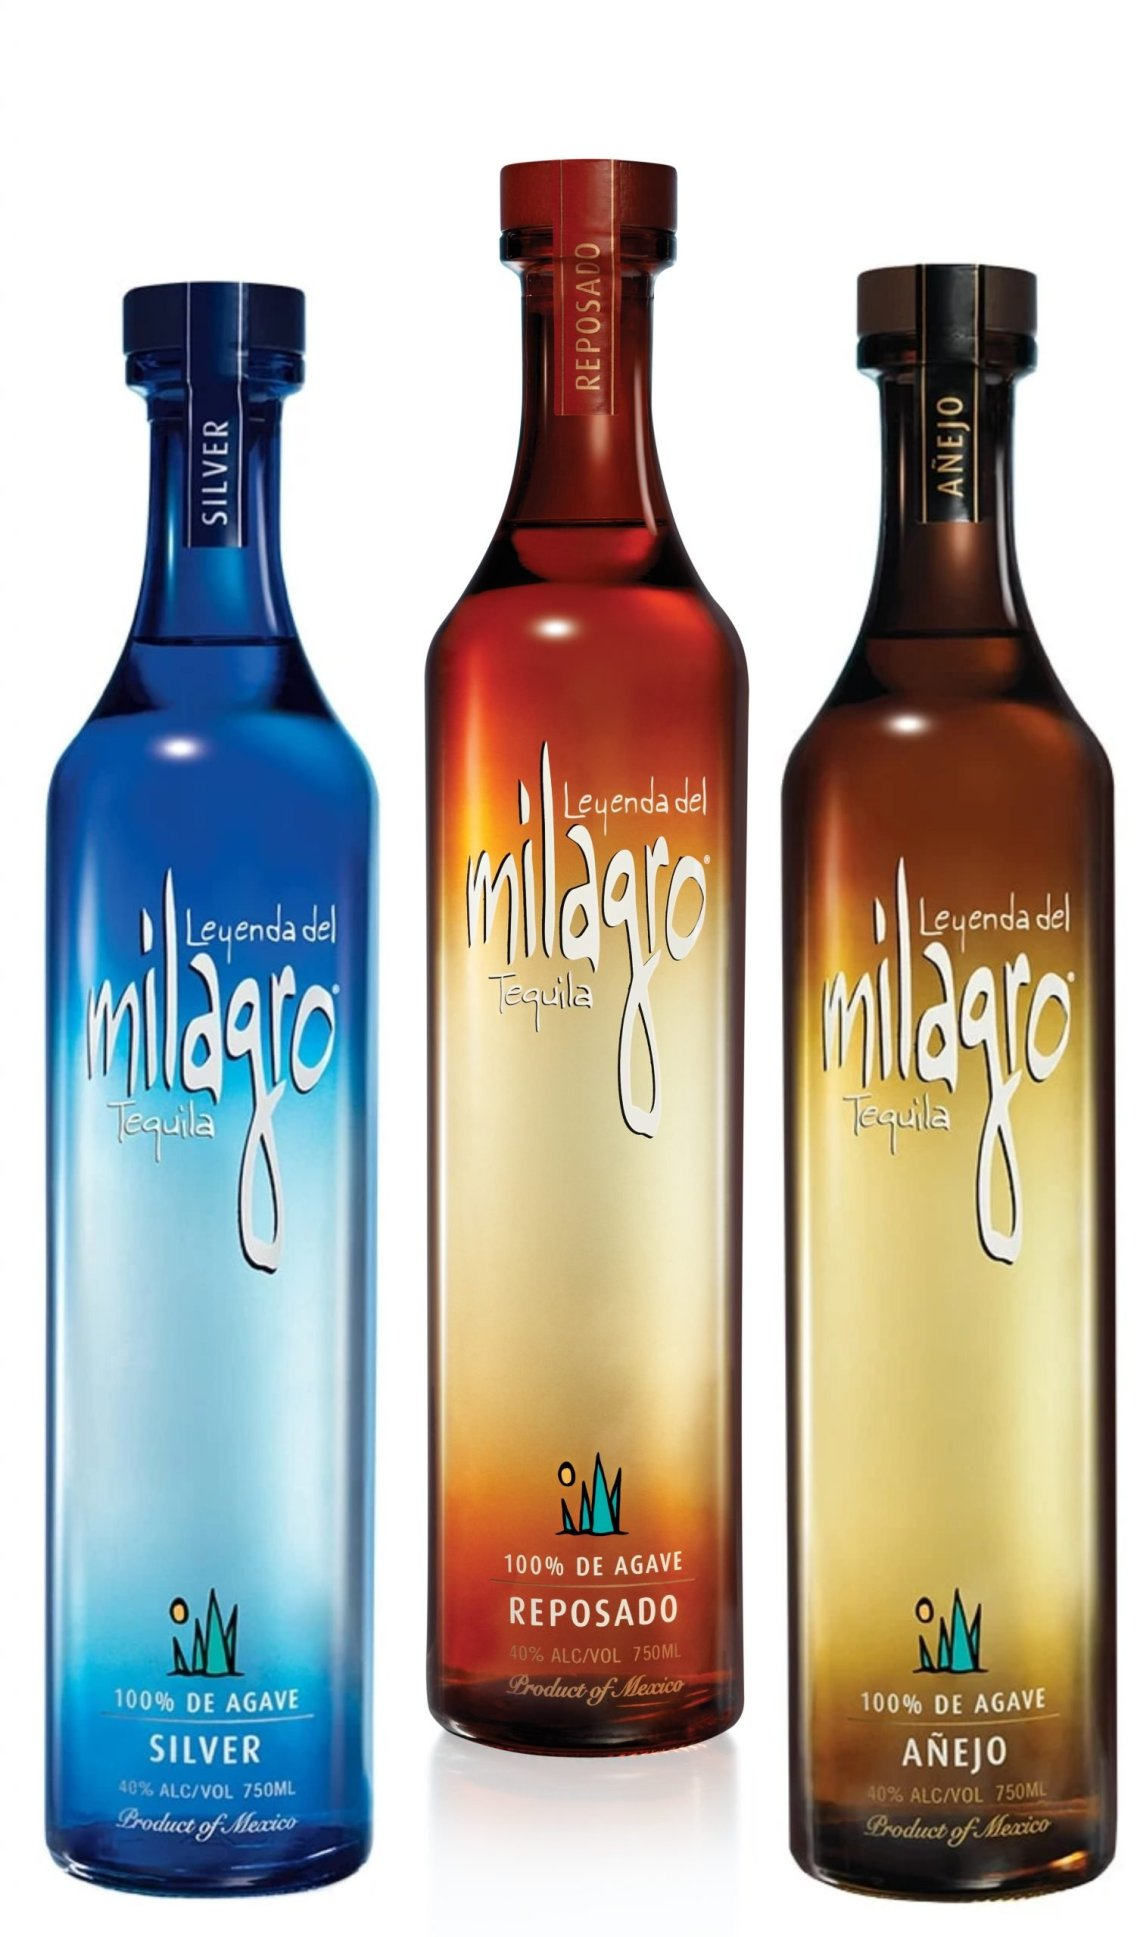 Milagro Tequila Reposado (2021)